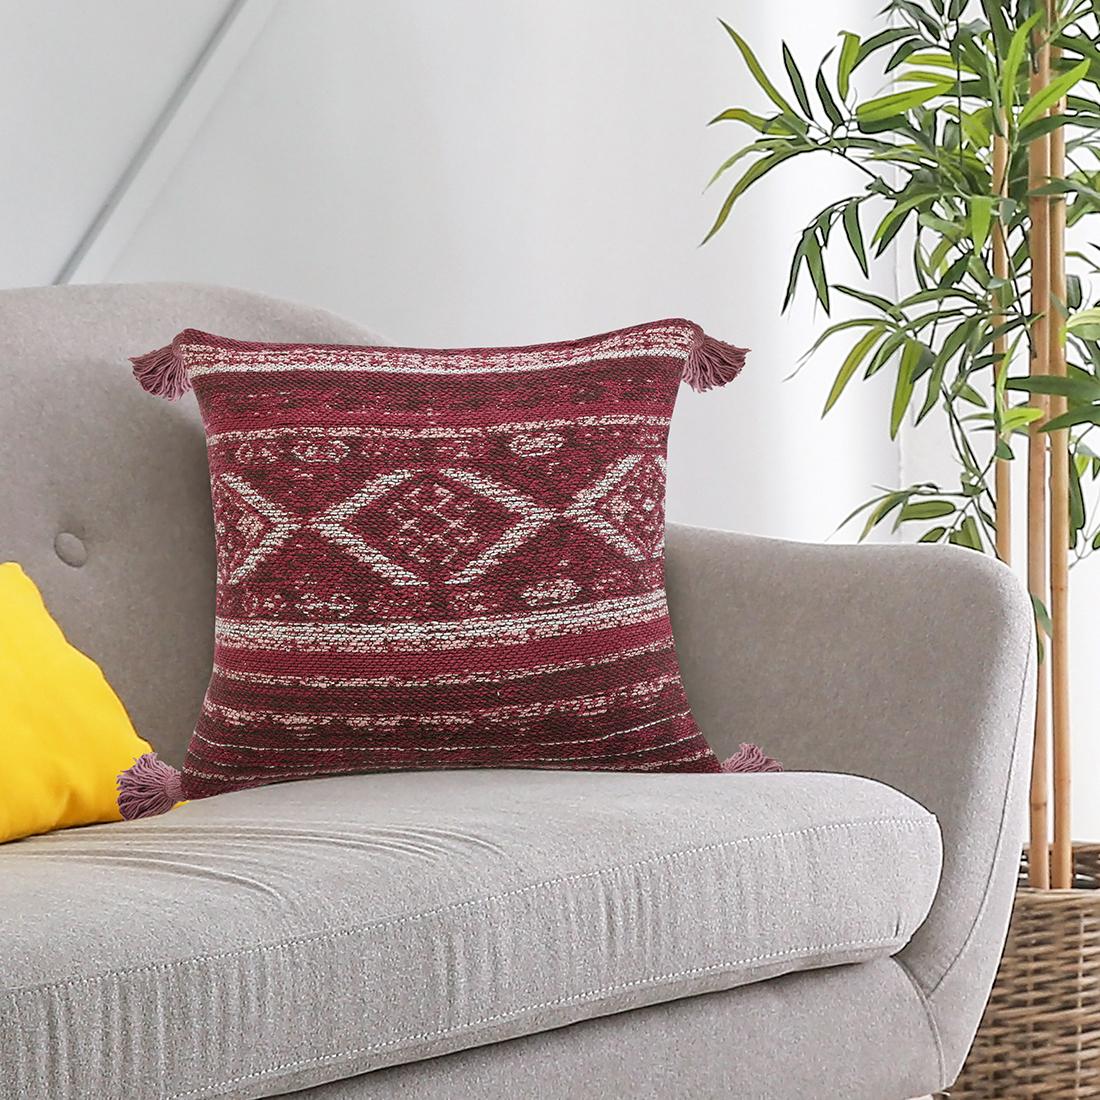 Maroon Cotton Jacquard Cushion With Tassels